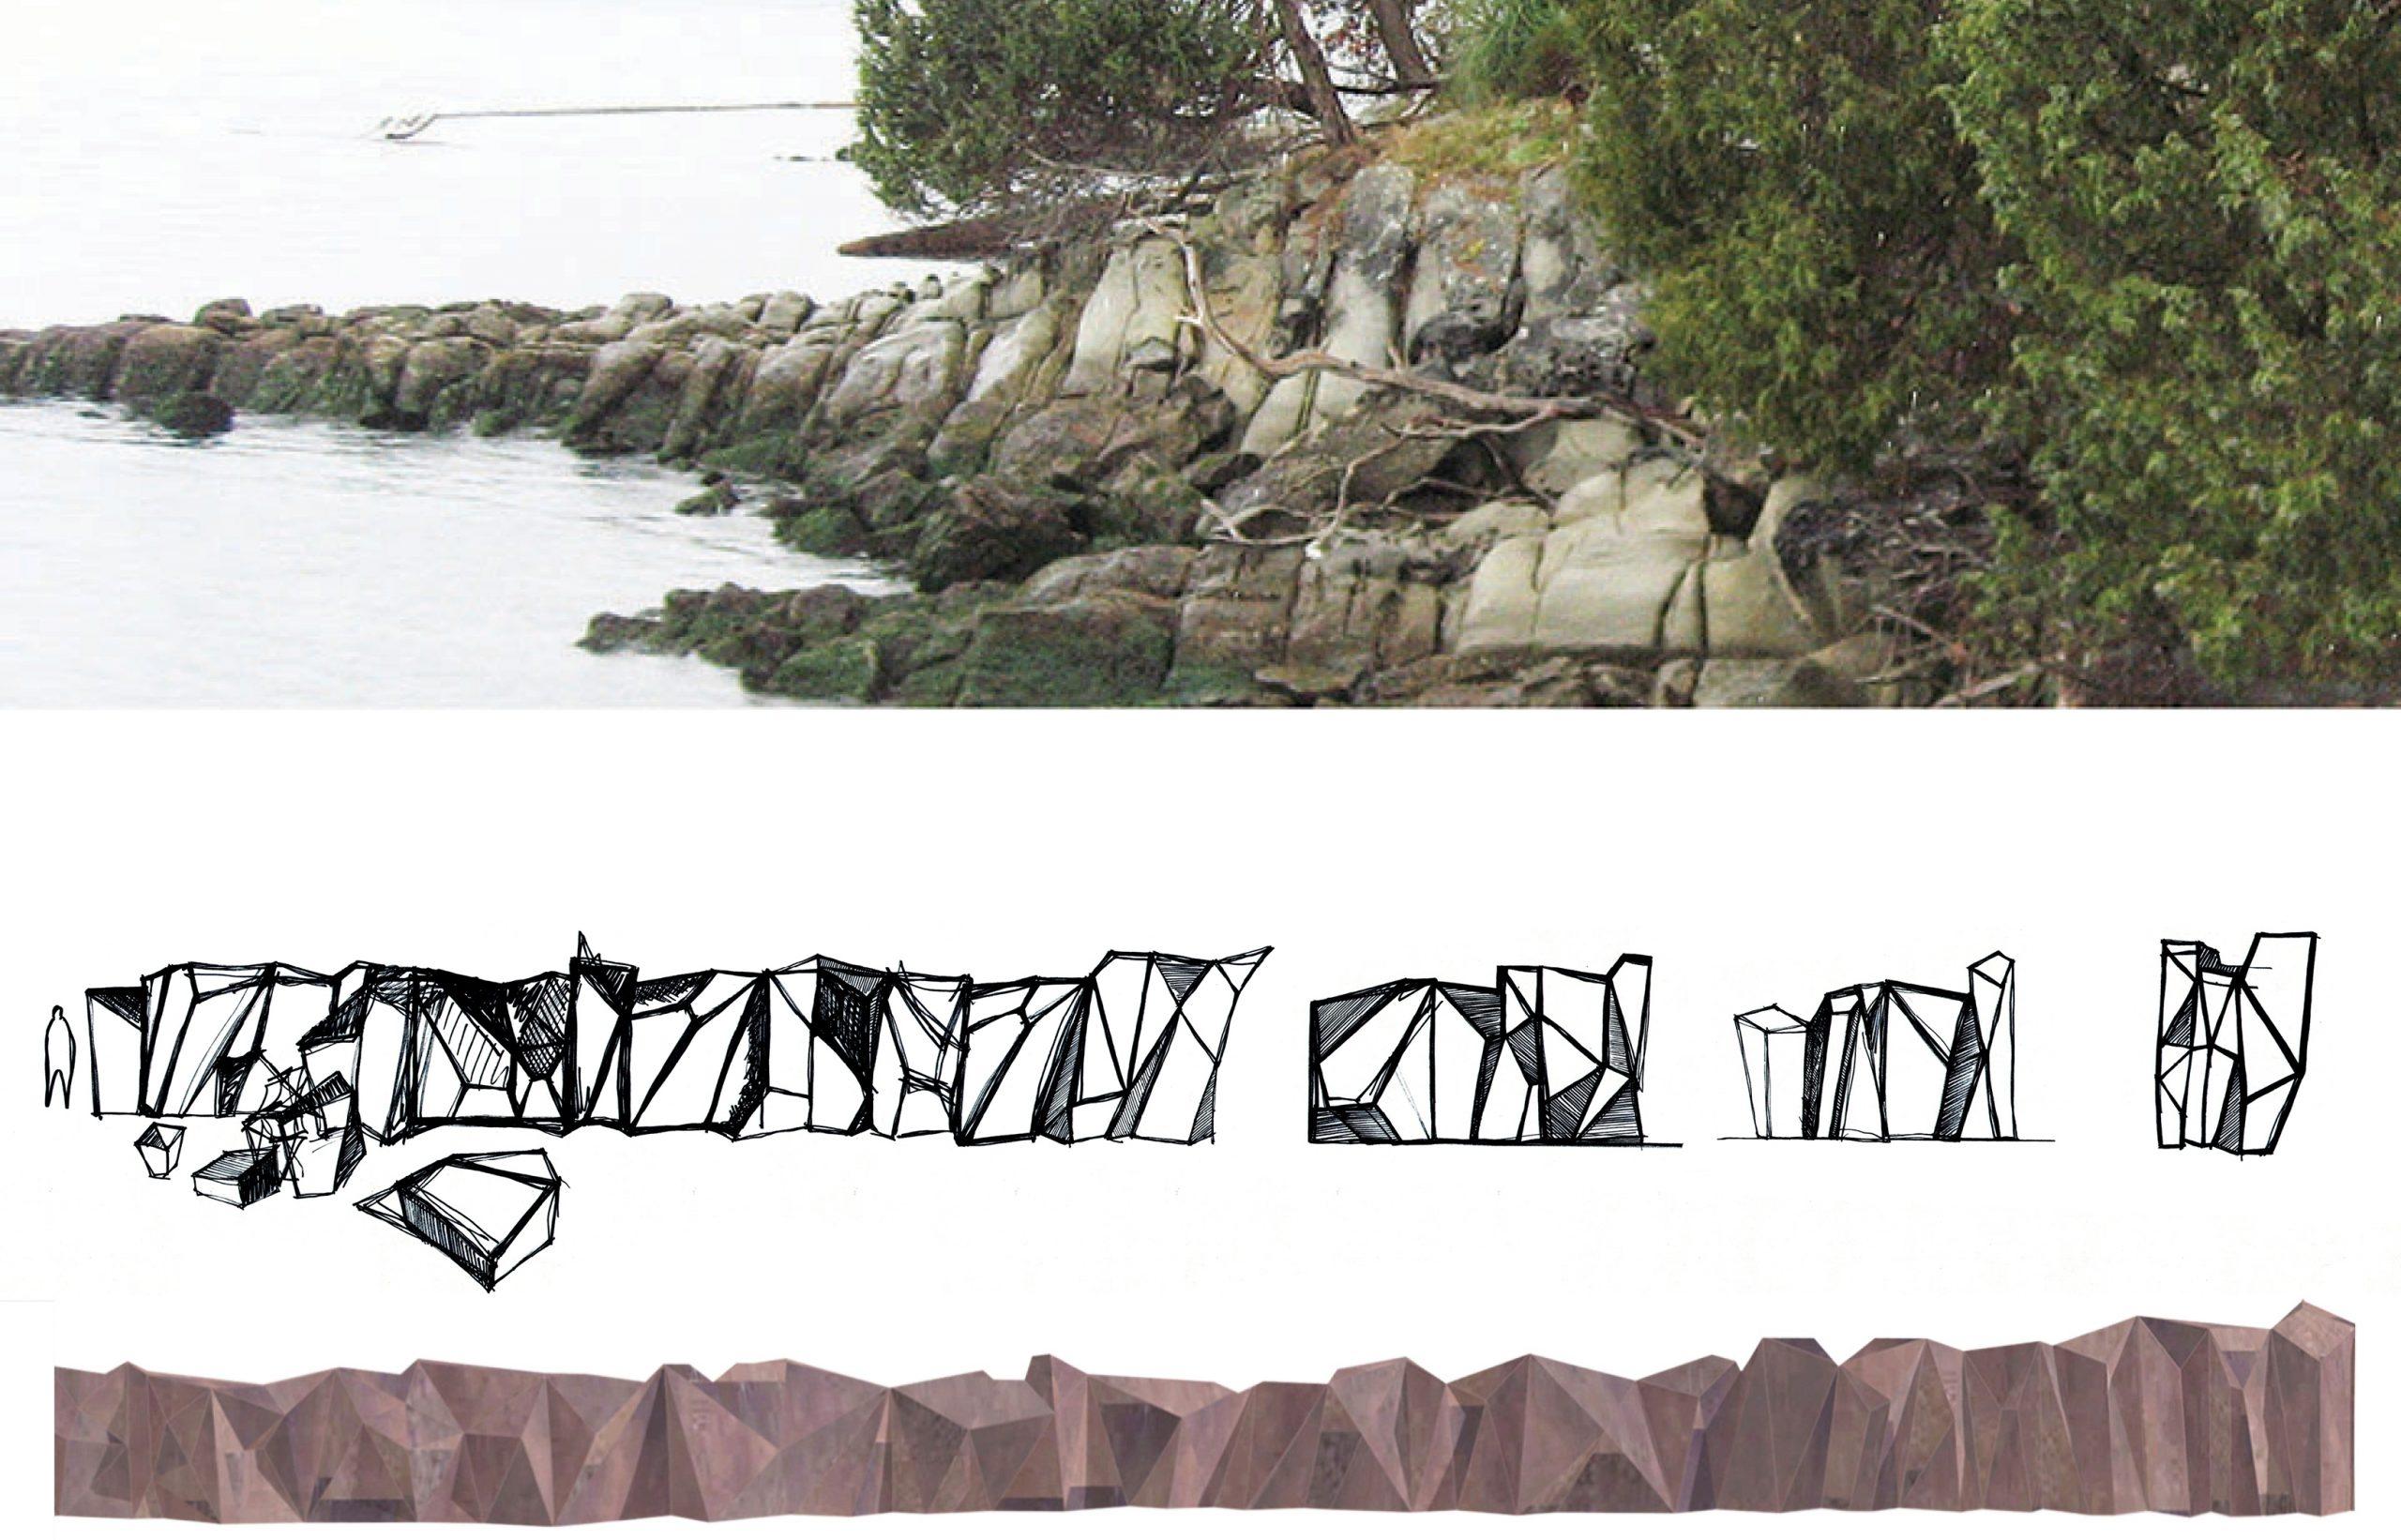 Metamorphous – A Corten Steel Seawall Sculpture and Foreshore Development